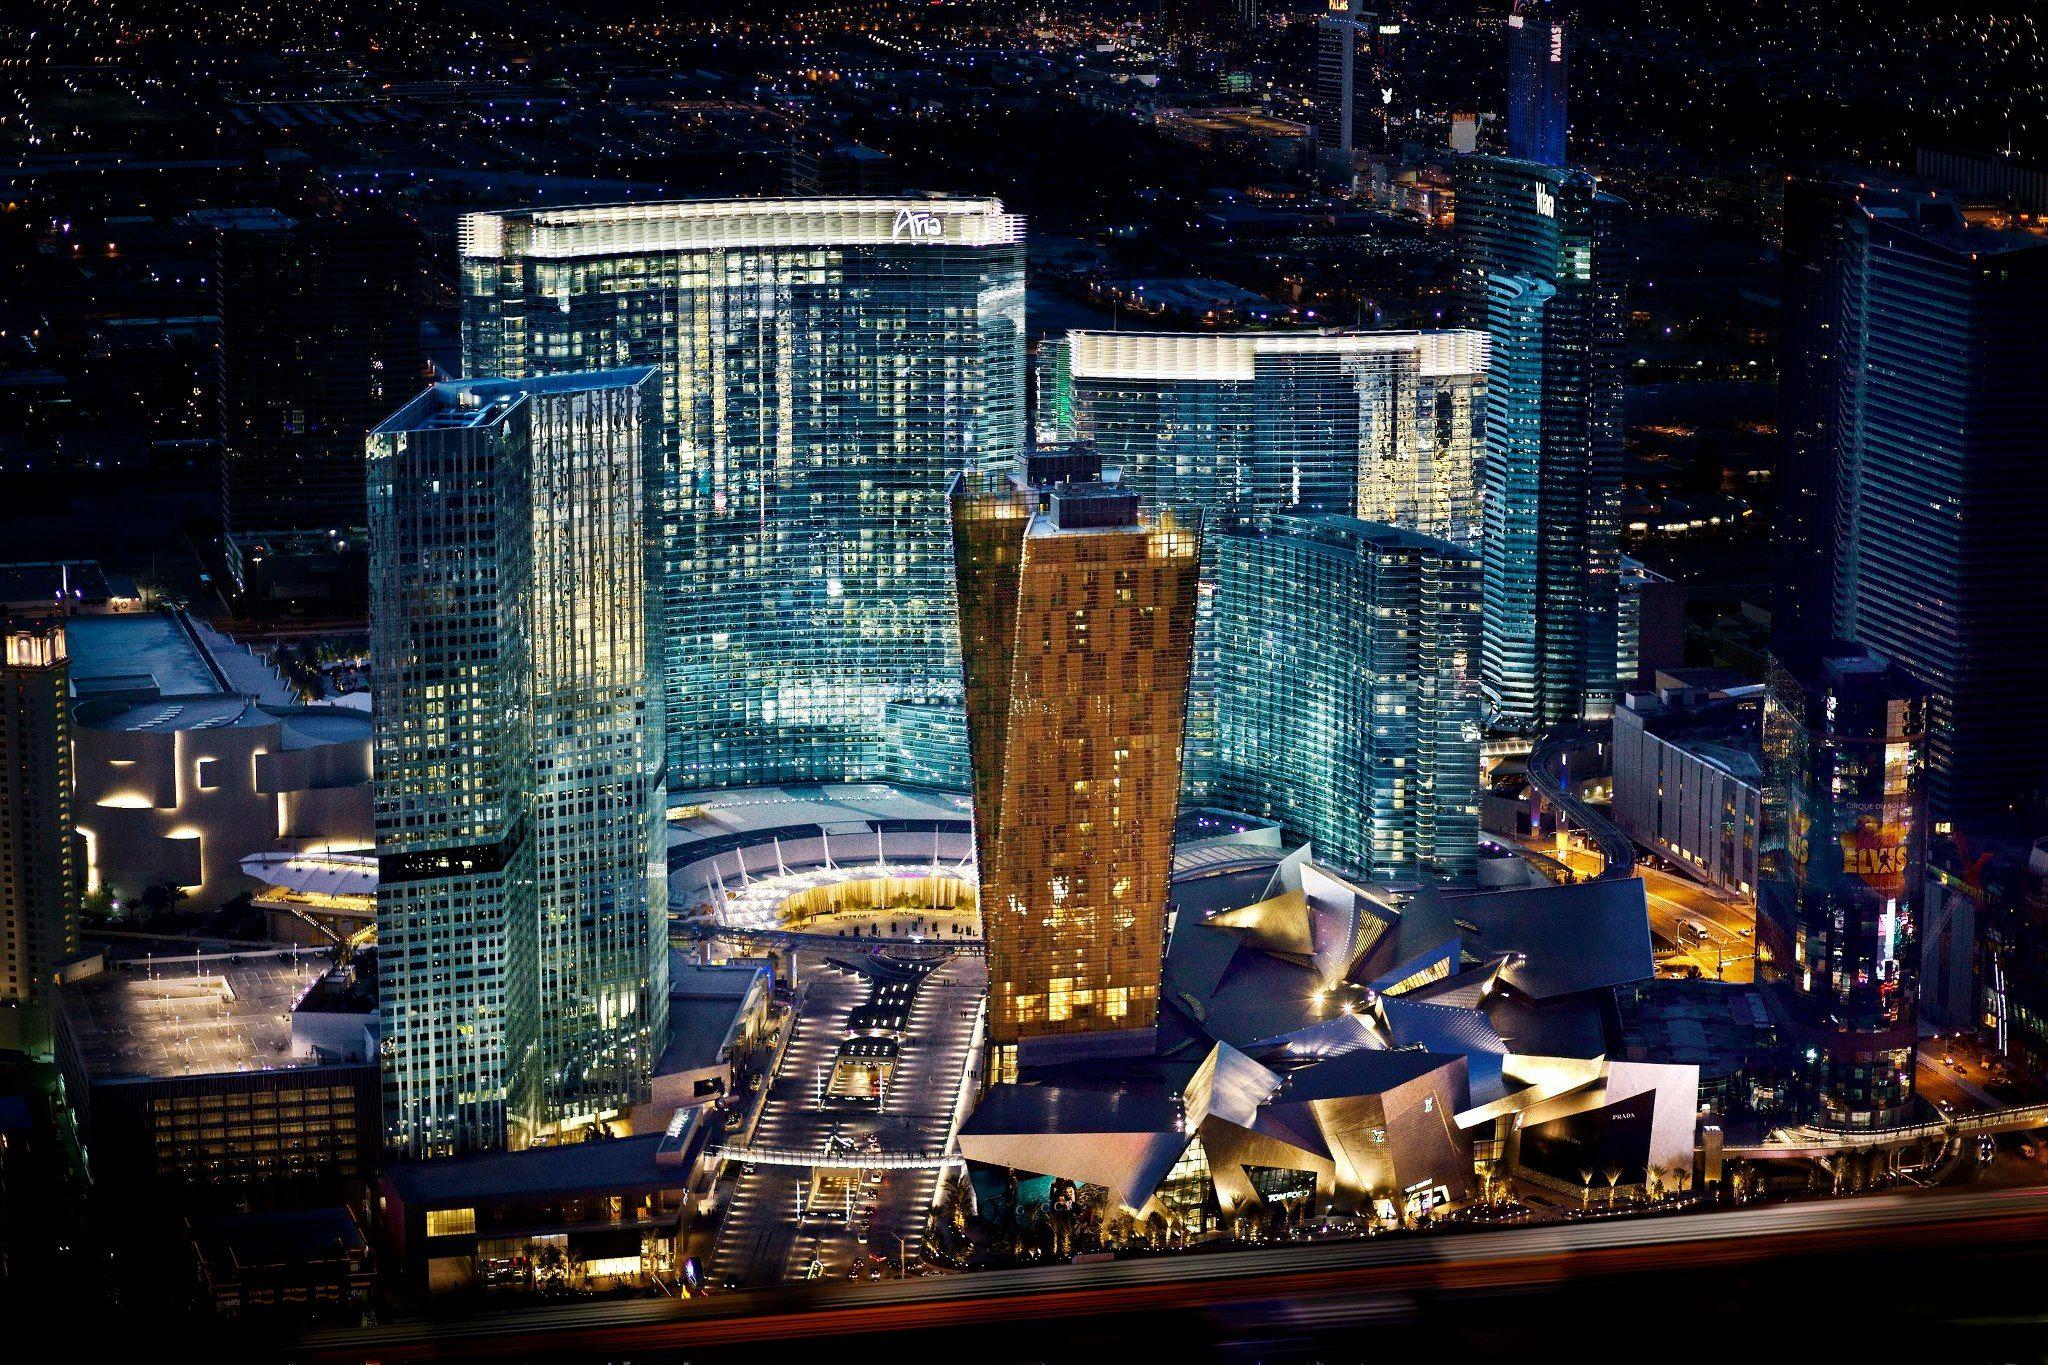 Citycenter Las Vegas With Images Las Vegas Vacation Best